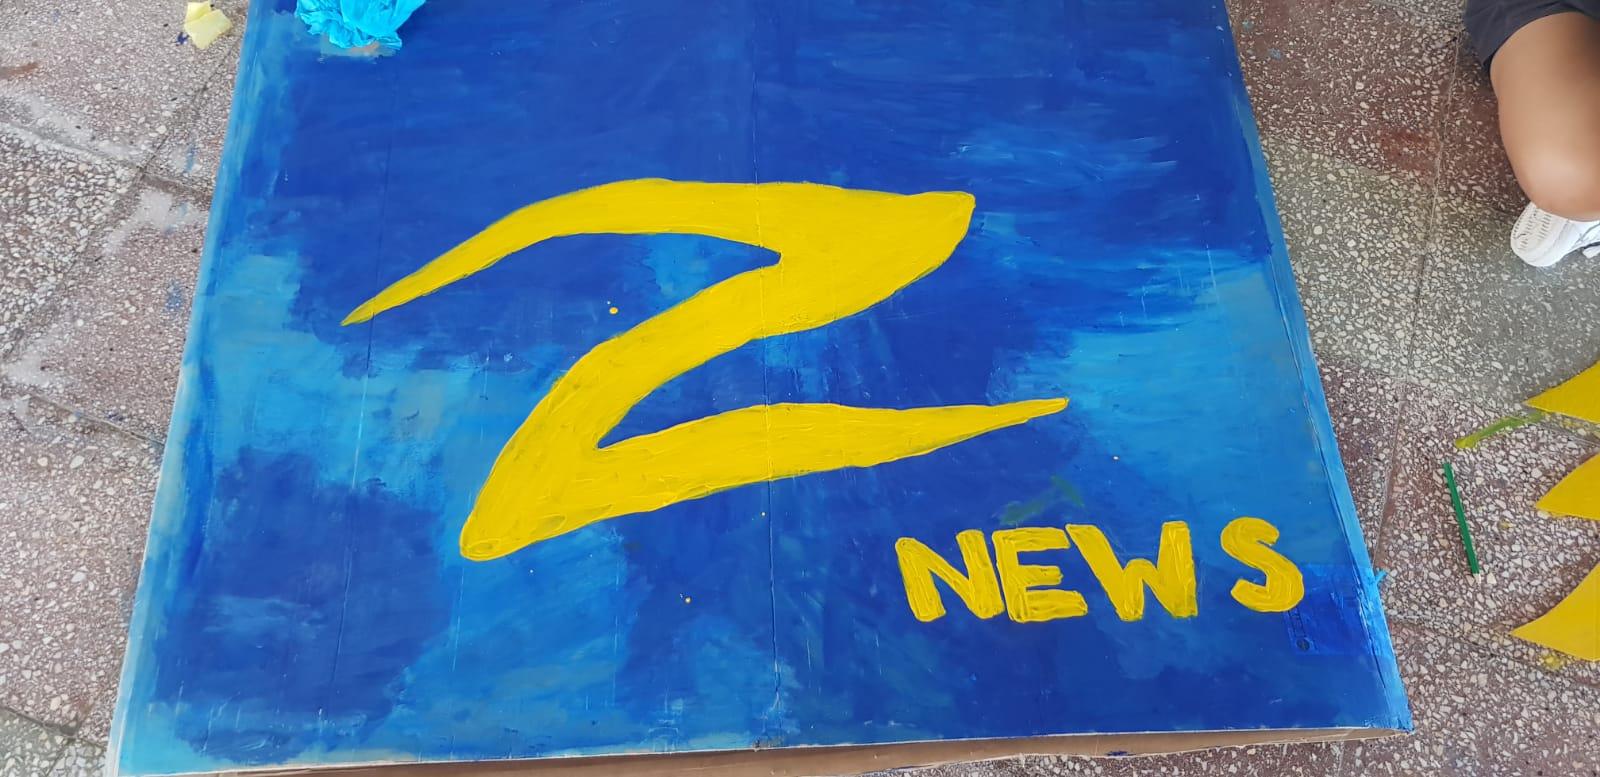 Z camp, Day 20 - Arts and Crafts - Z news logo